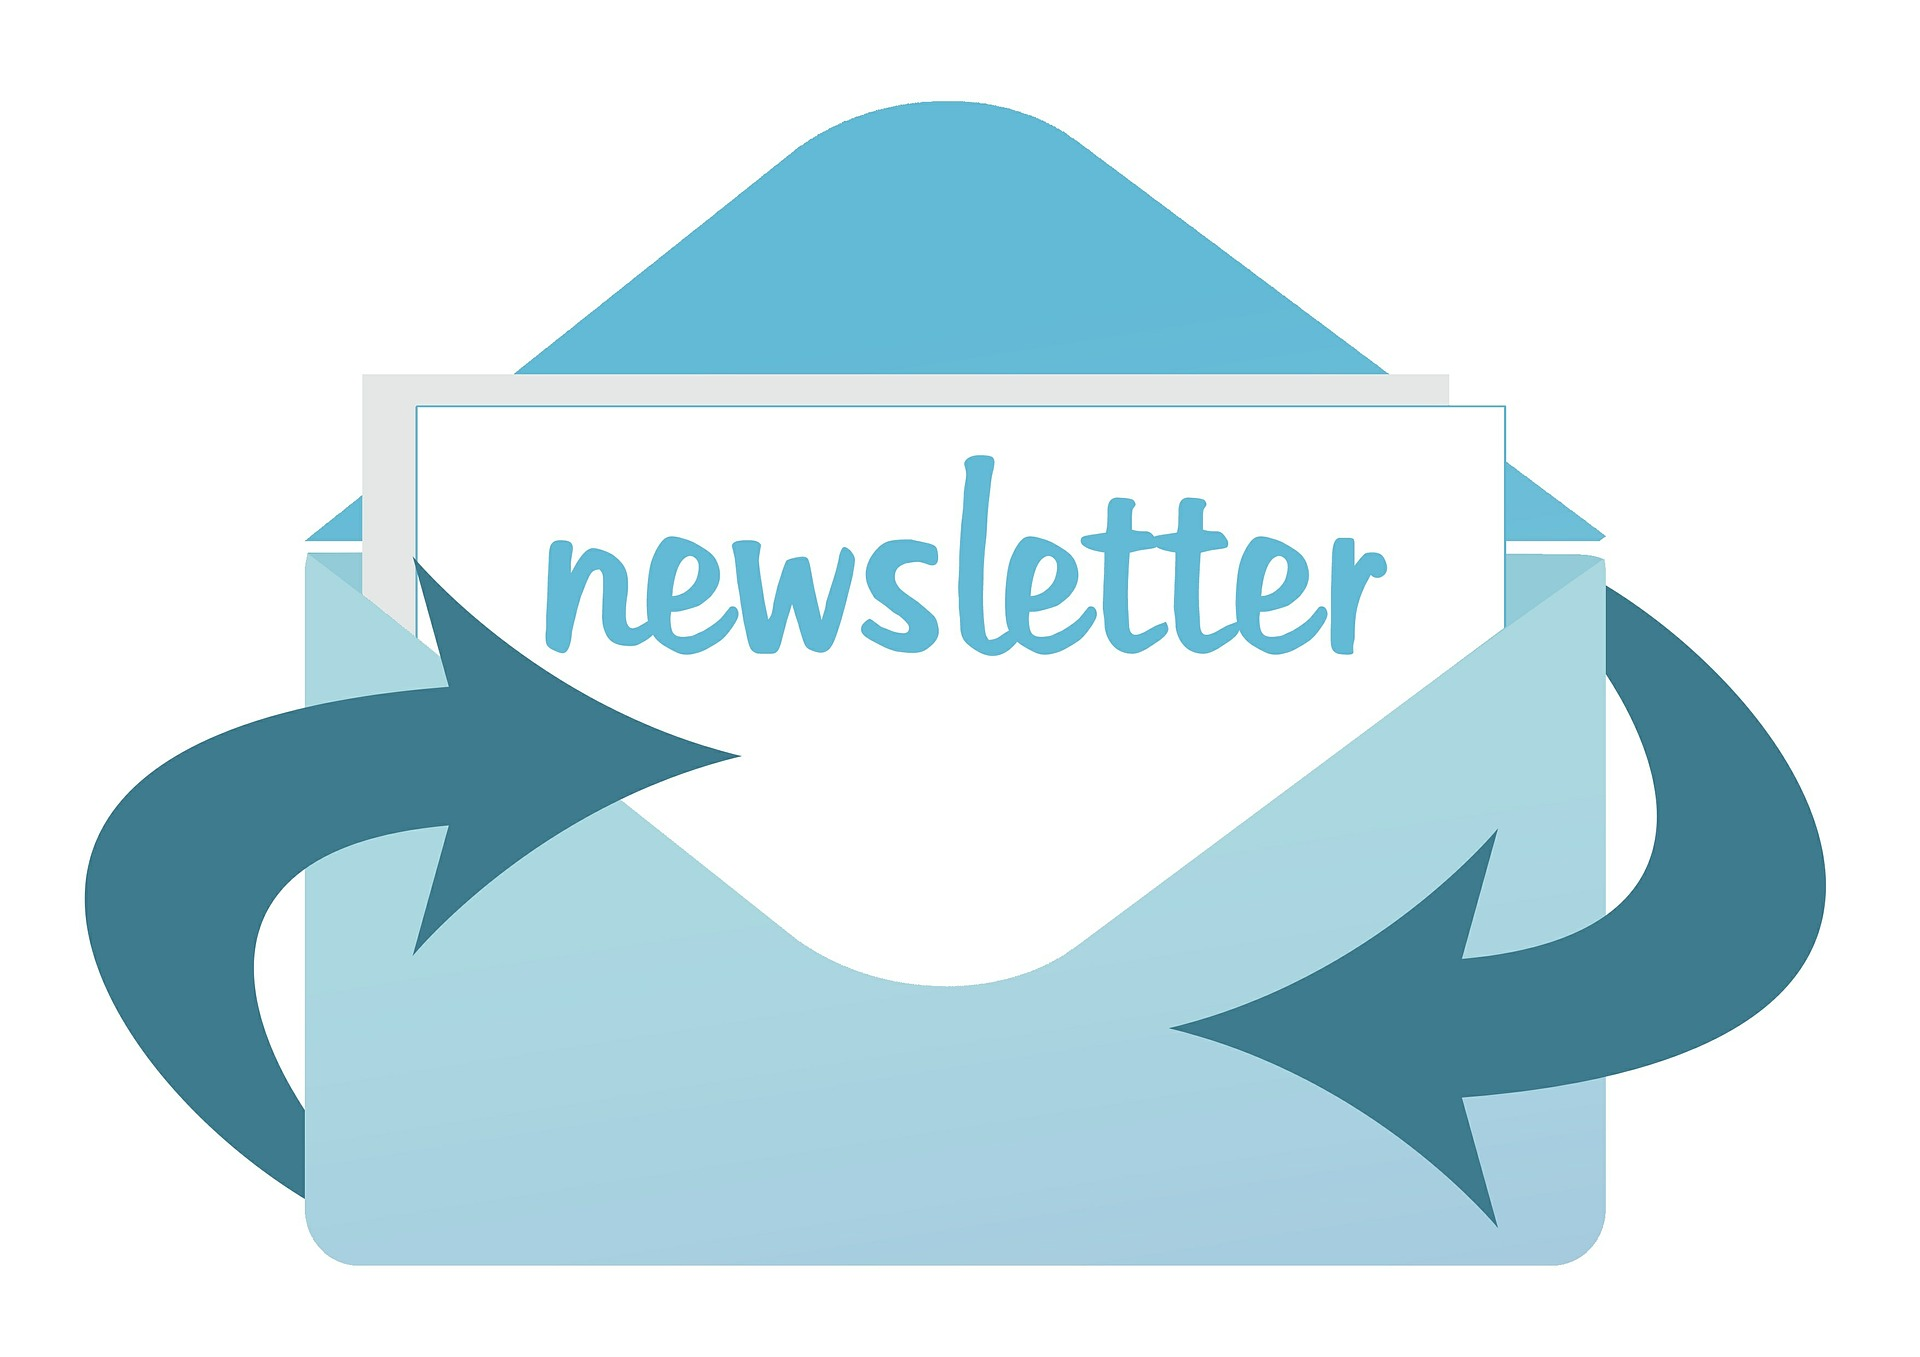 Newsletter-Anmeldung